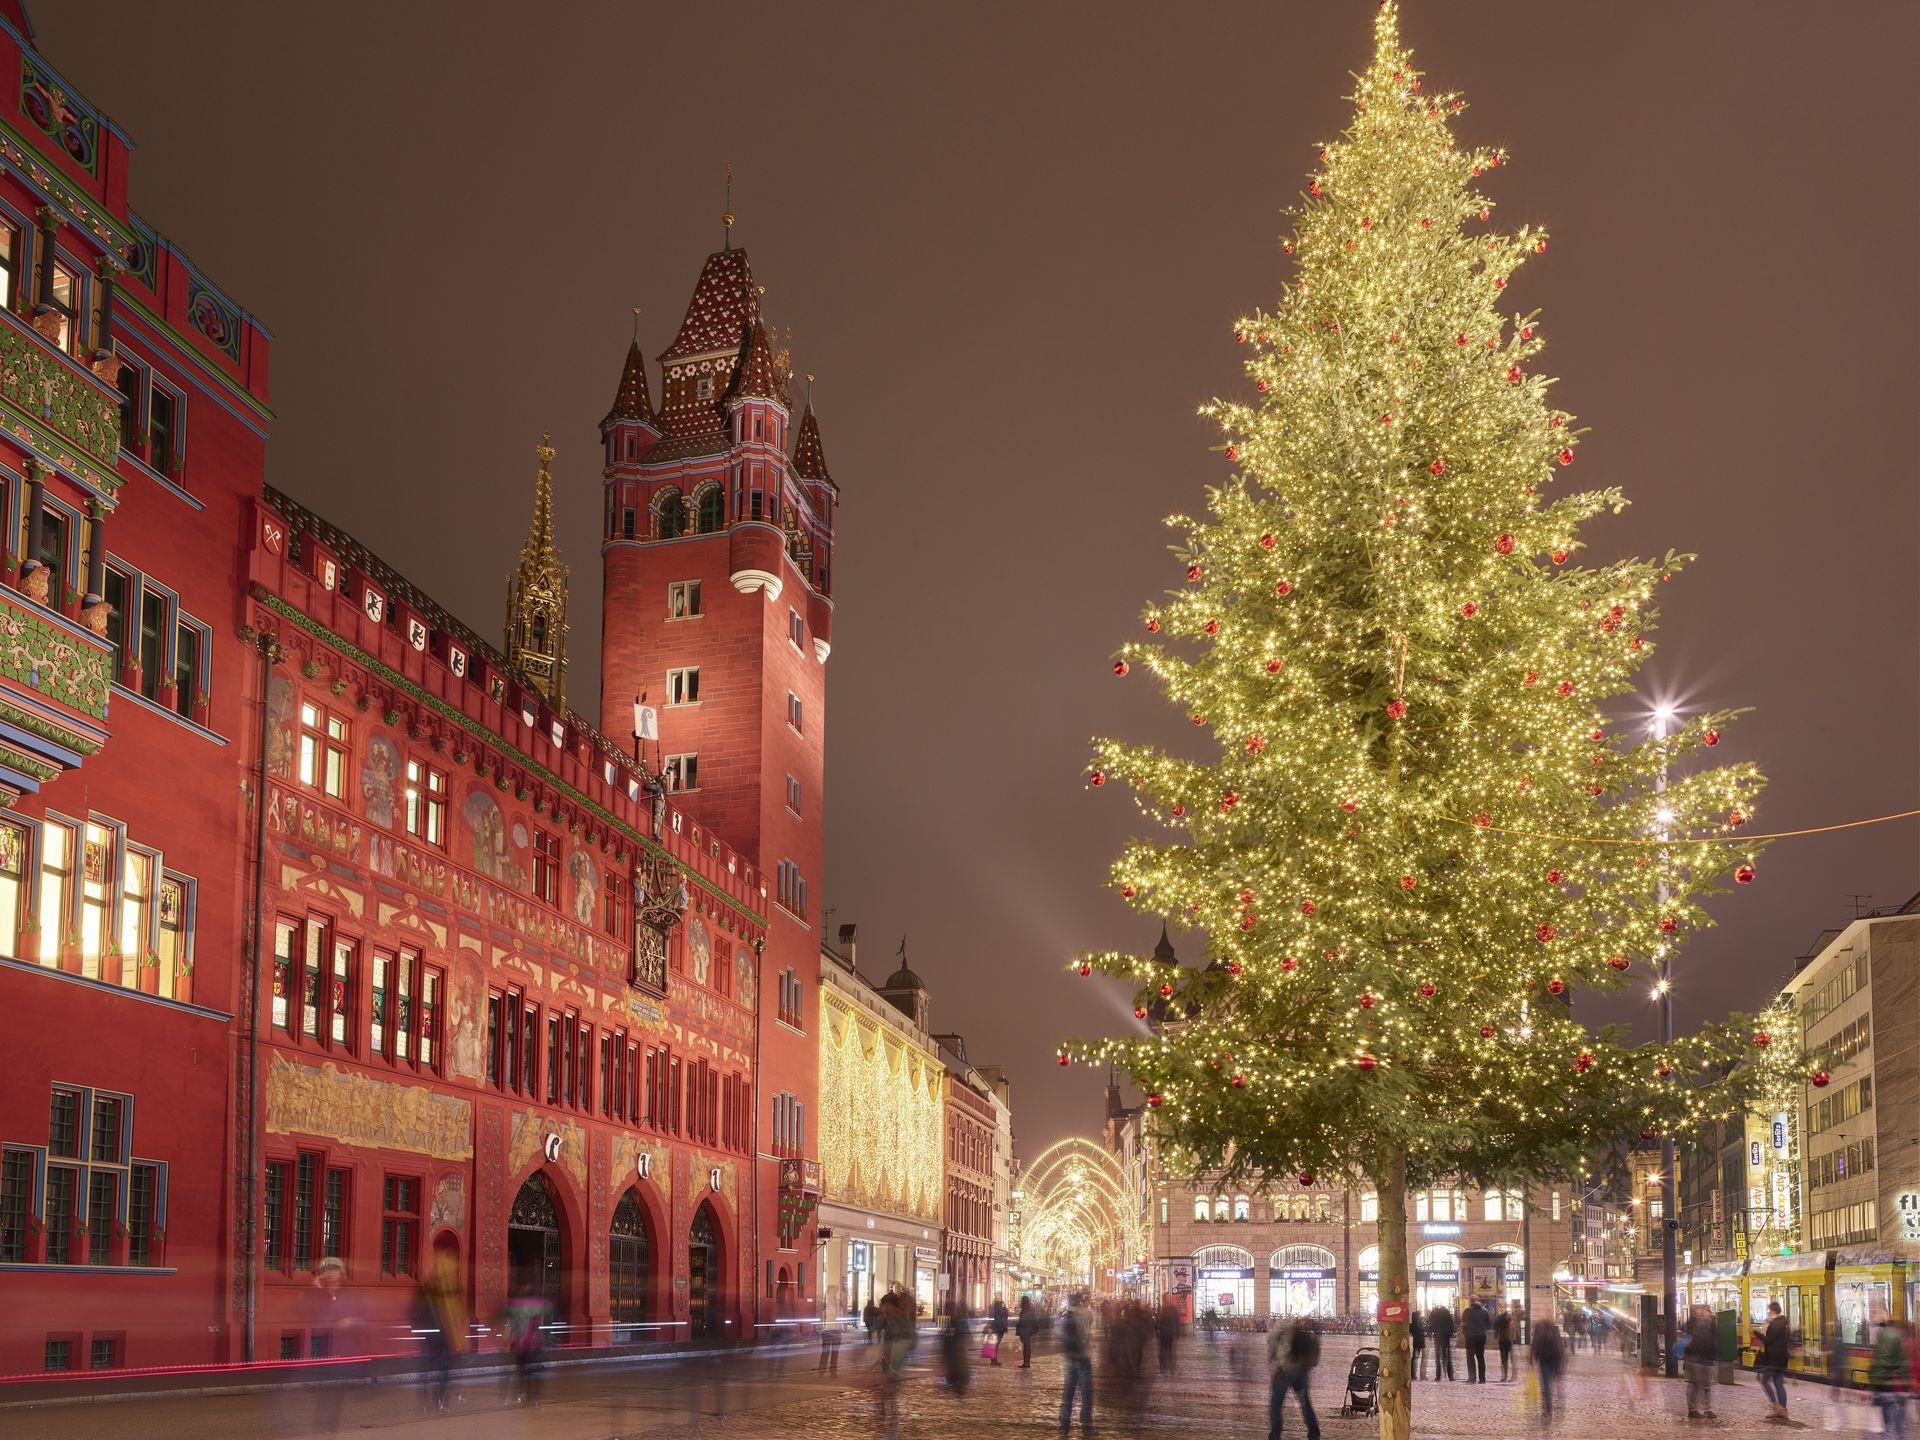 Weihnachtsbaum am Marktplatz in Basel // Christmas tree at Marktplatz Basel